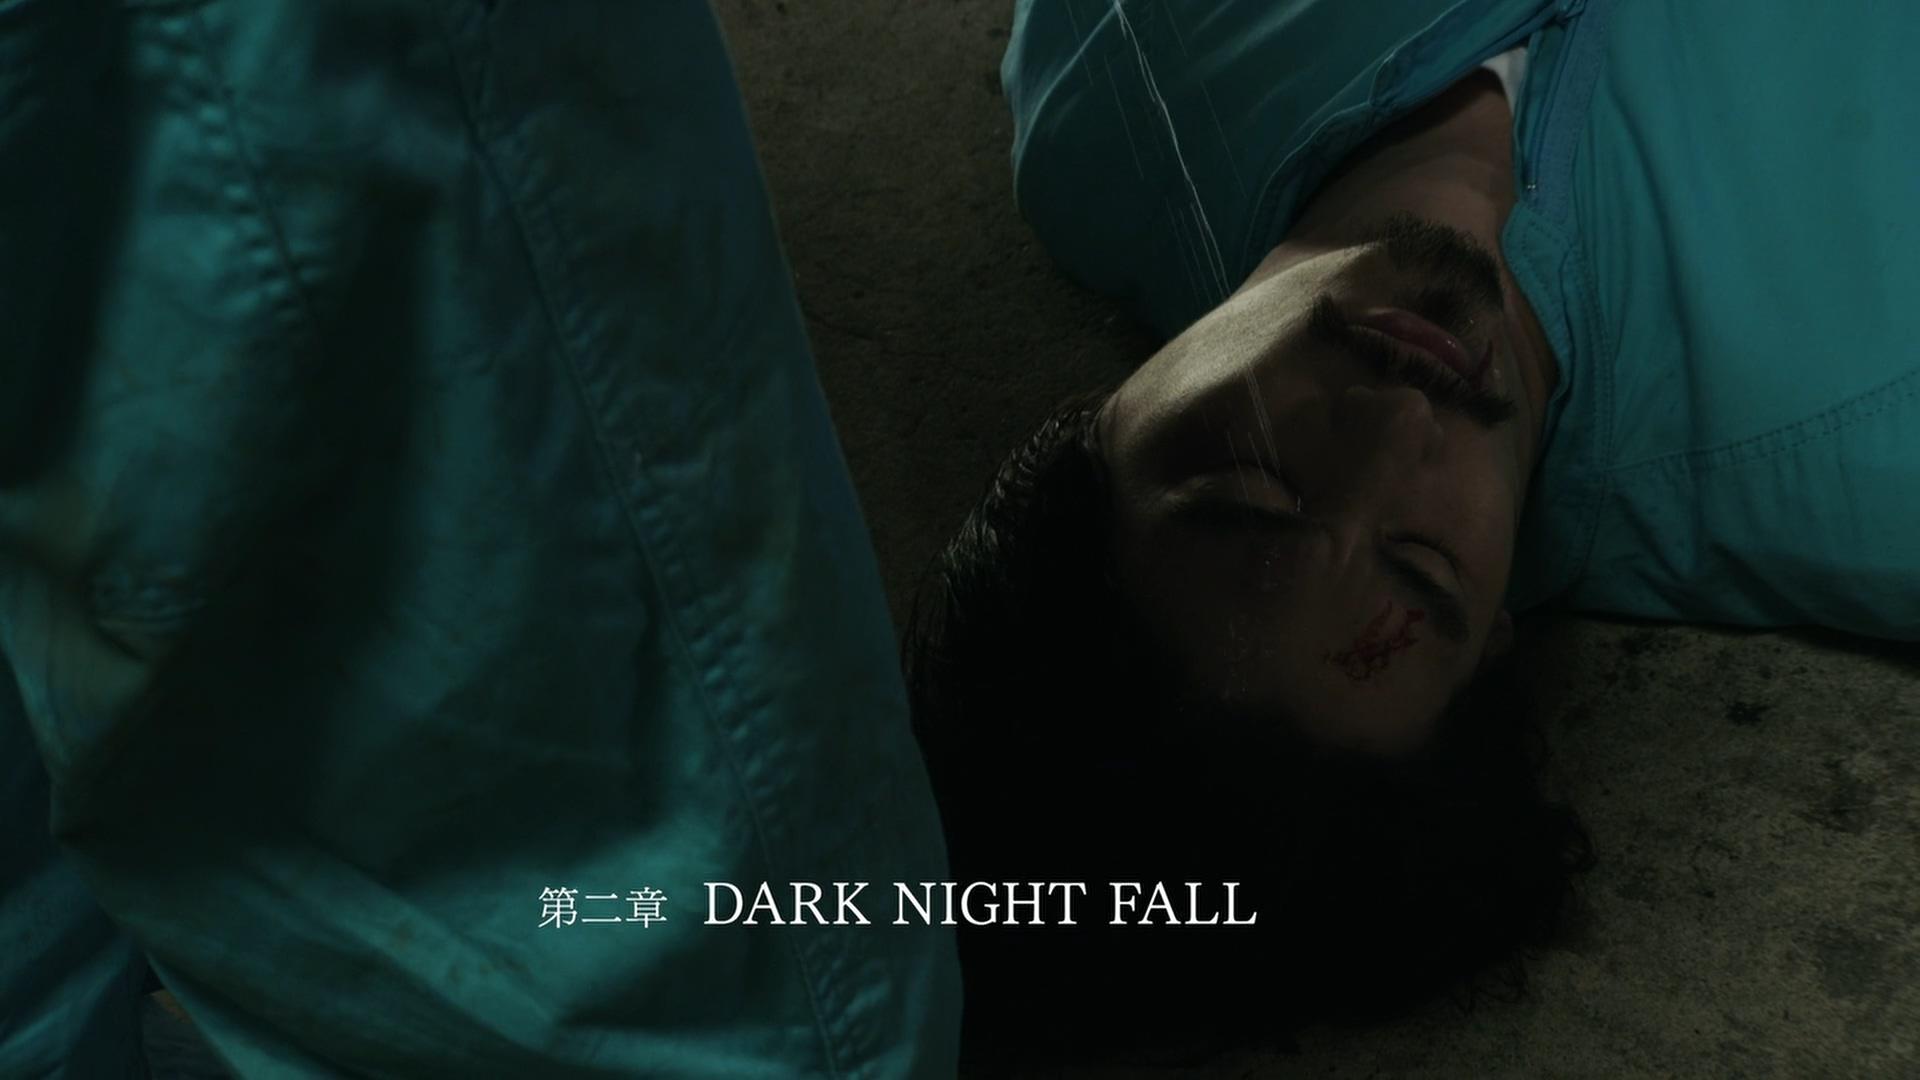 Second Chapter: DARK NIGHT FALL